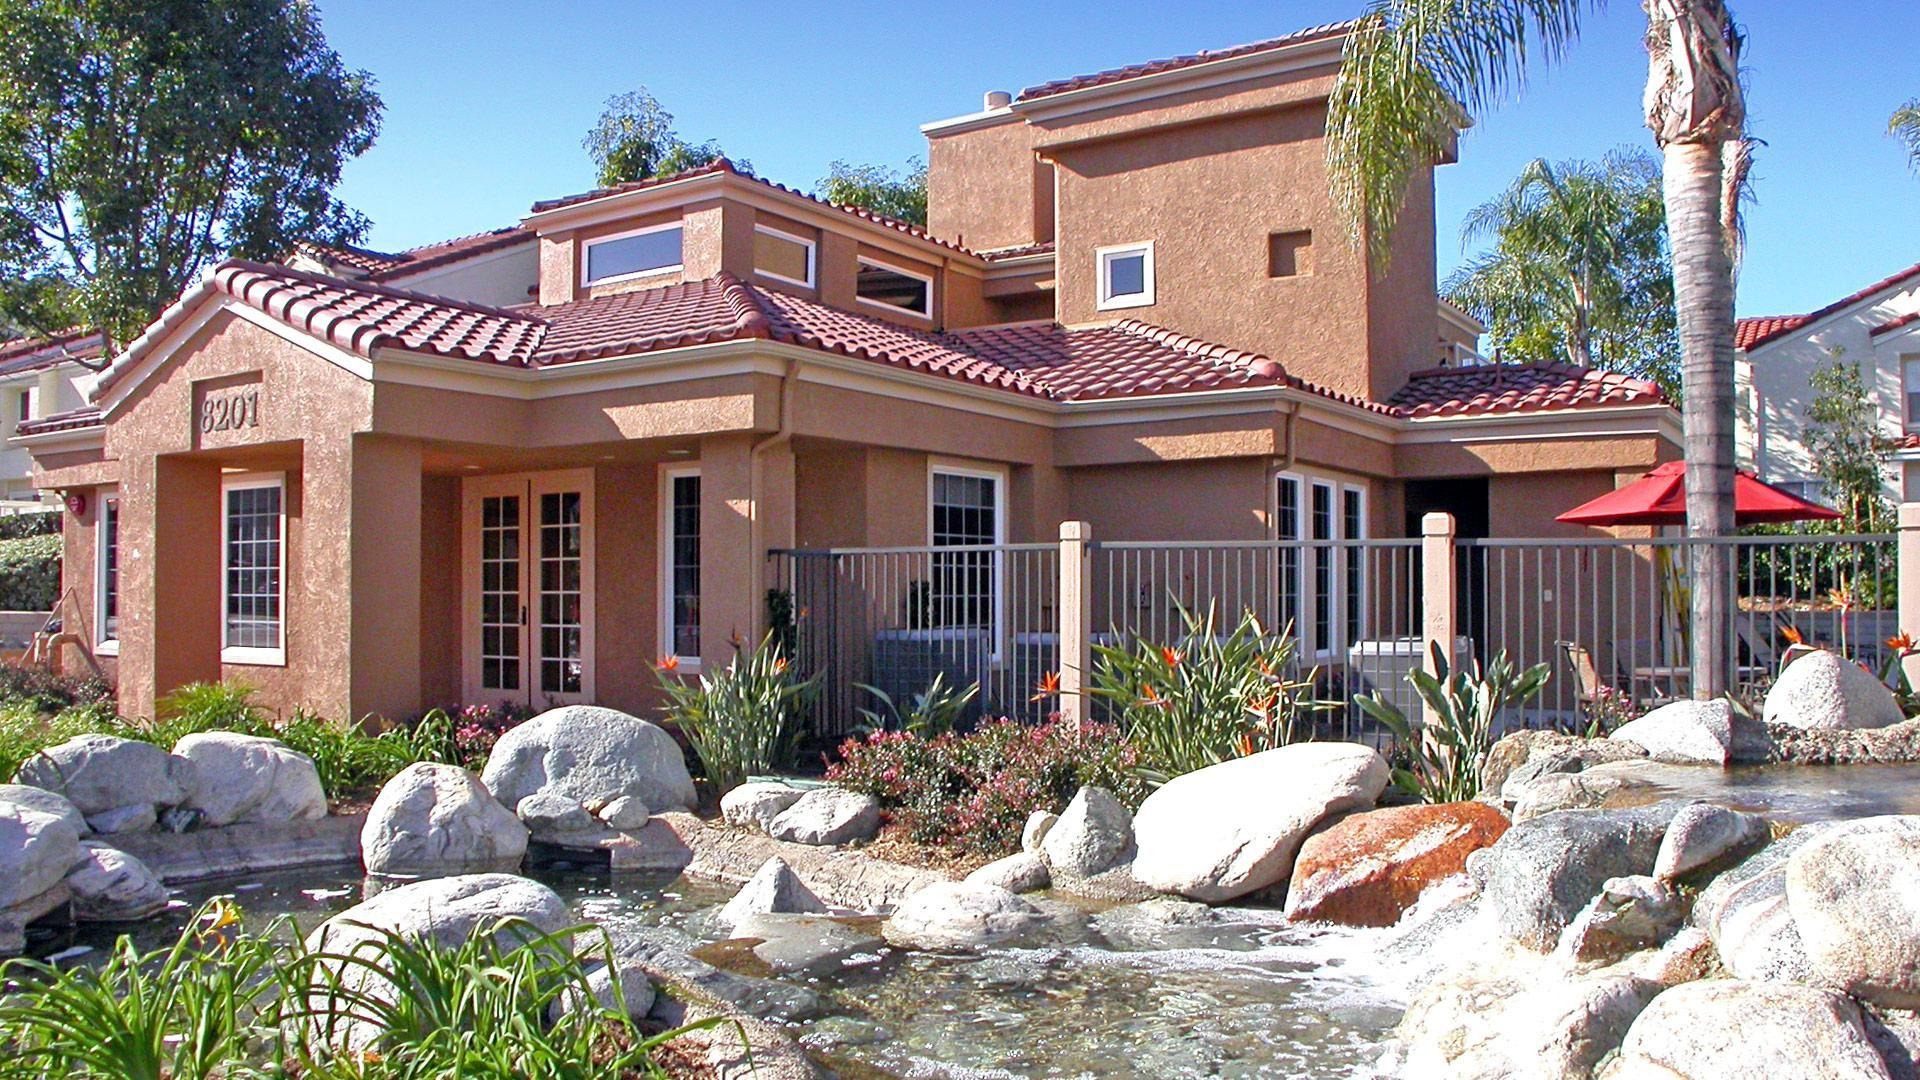 Sycamore Canyon Apartment Homes U2022 8201 E. Blackwillow Circle U2022 Anaheim Hills,  CA 92808